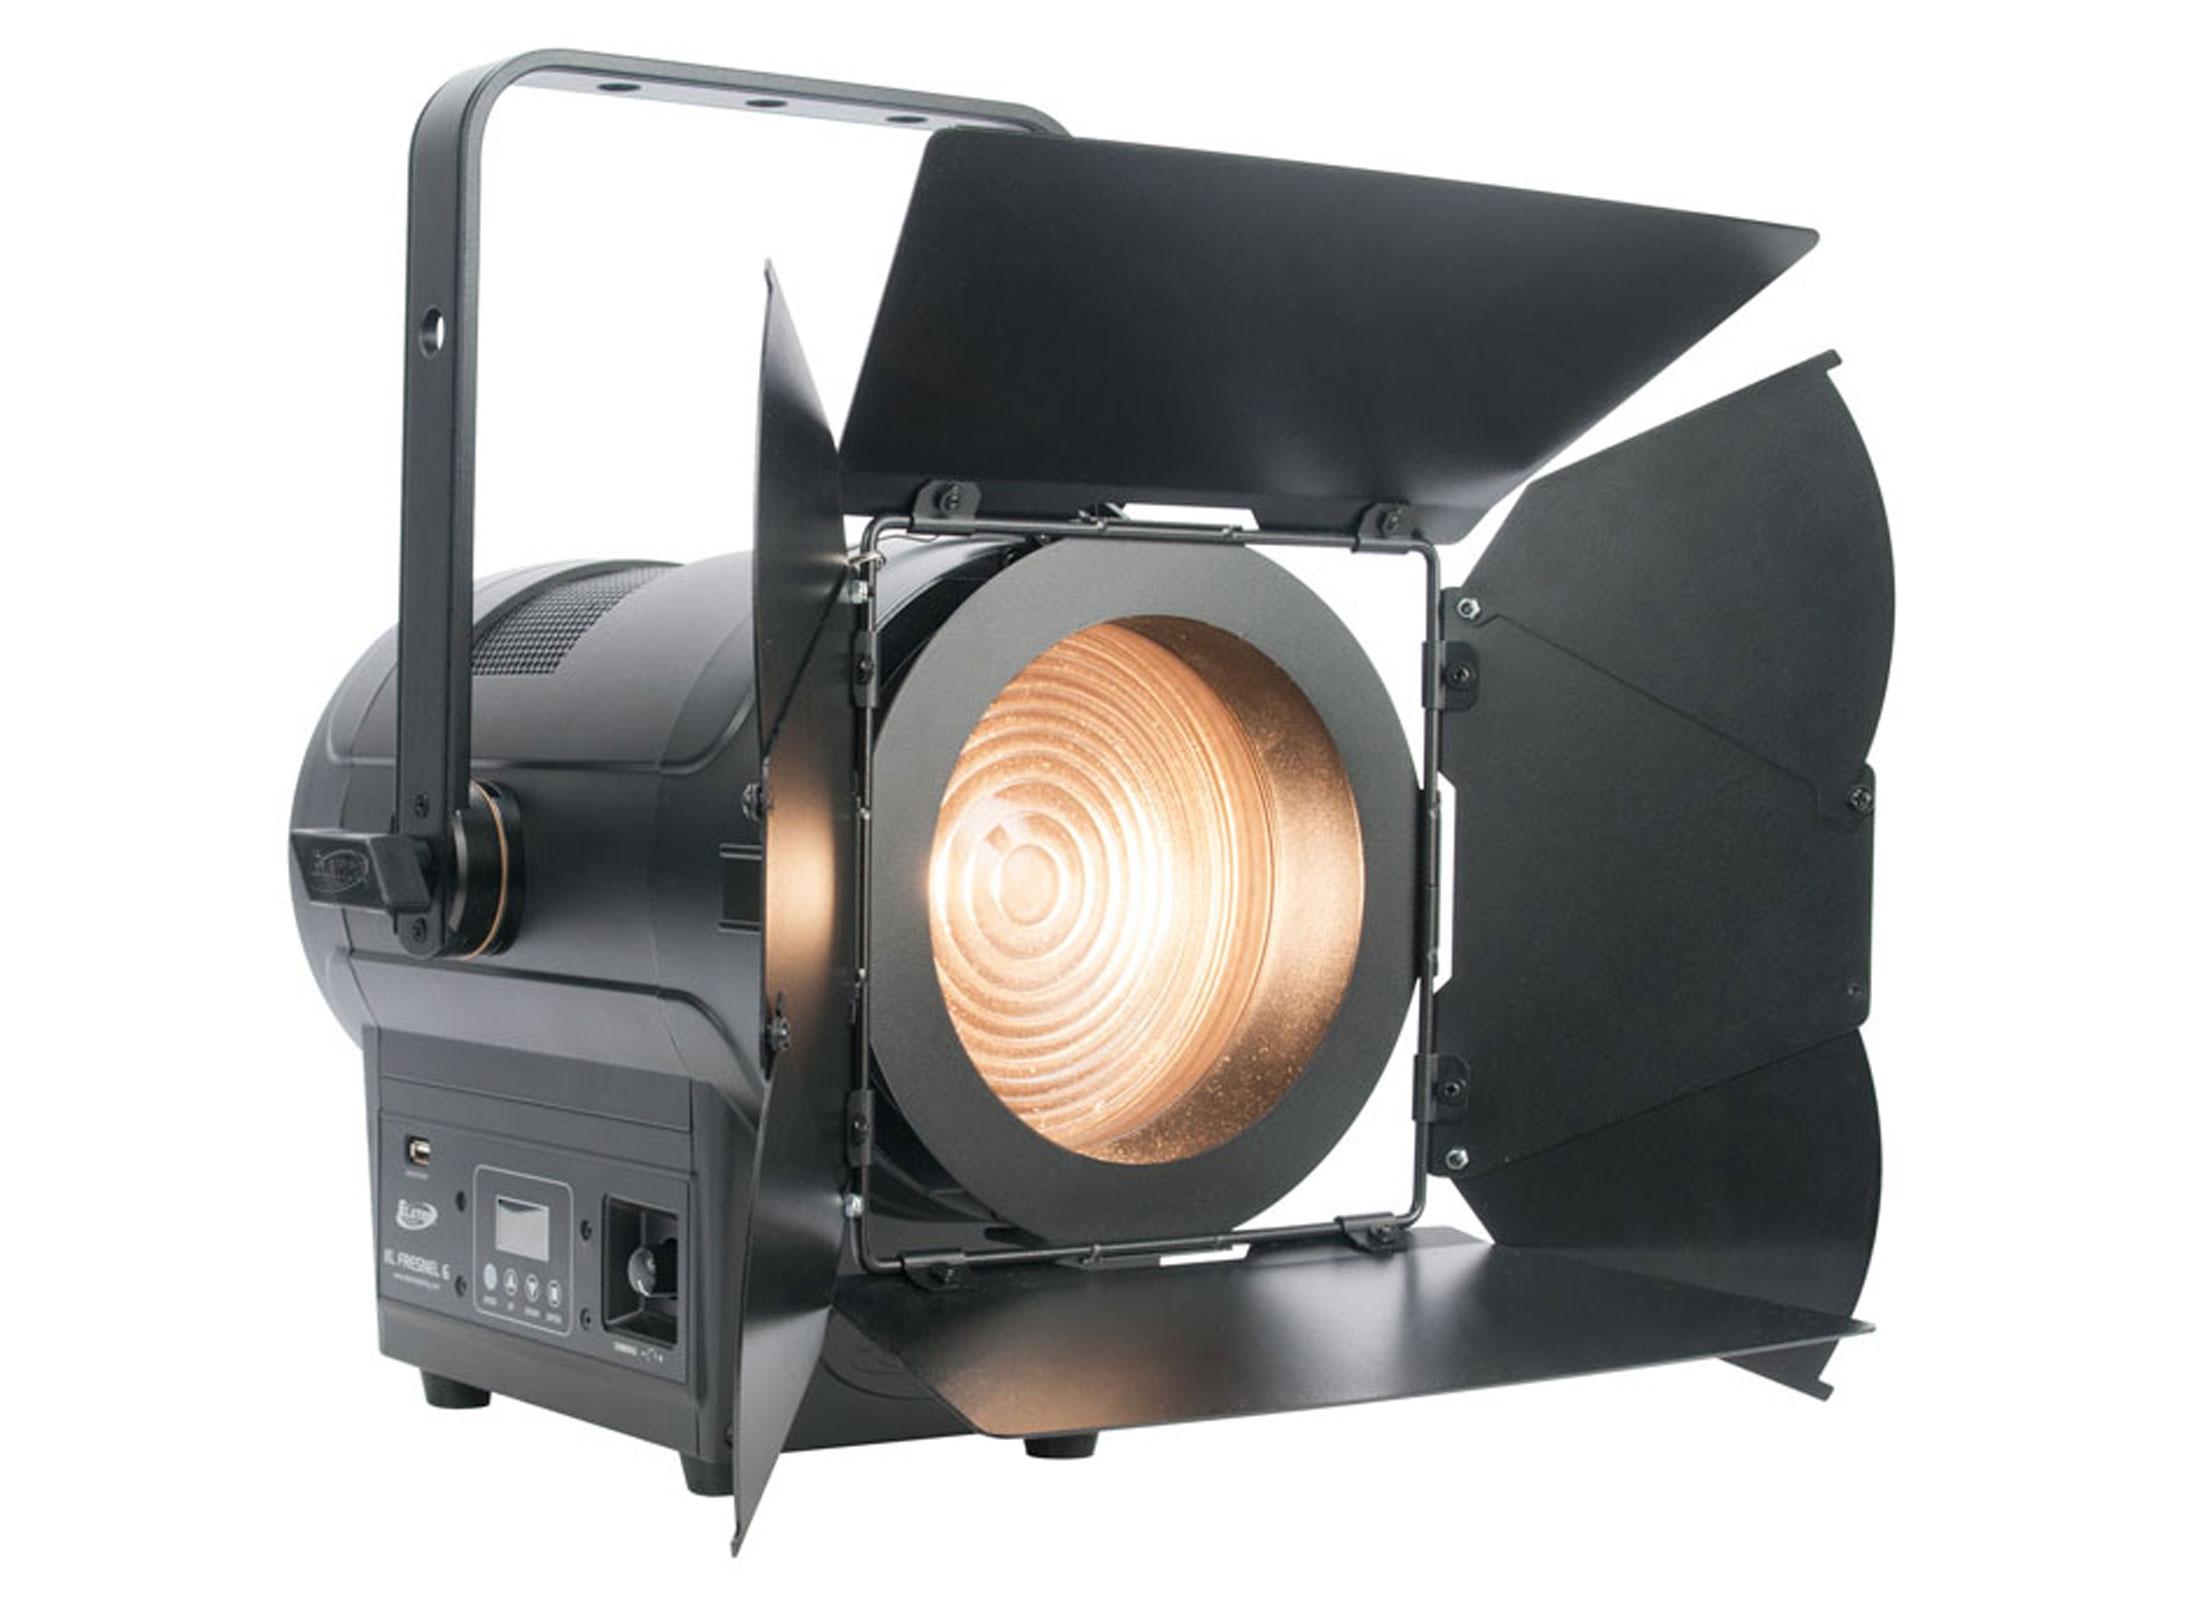 Dimmer Für Led Len elation kl fresnel 6 led lens spotlight at low prices at huss